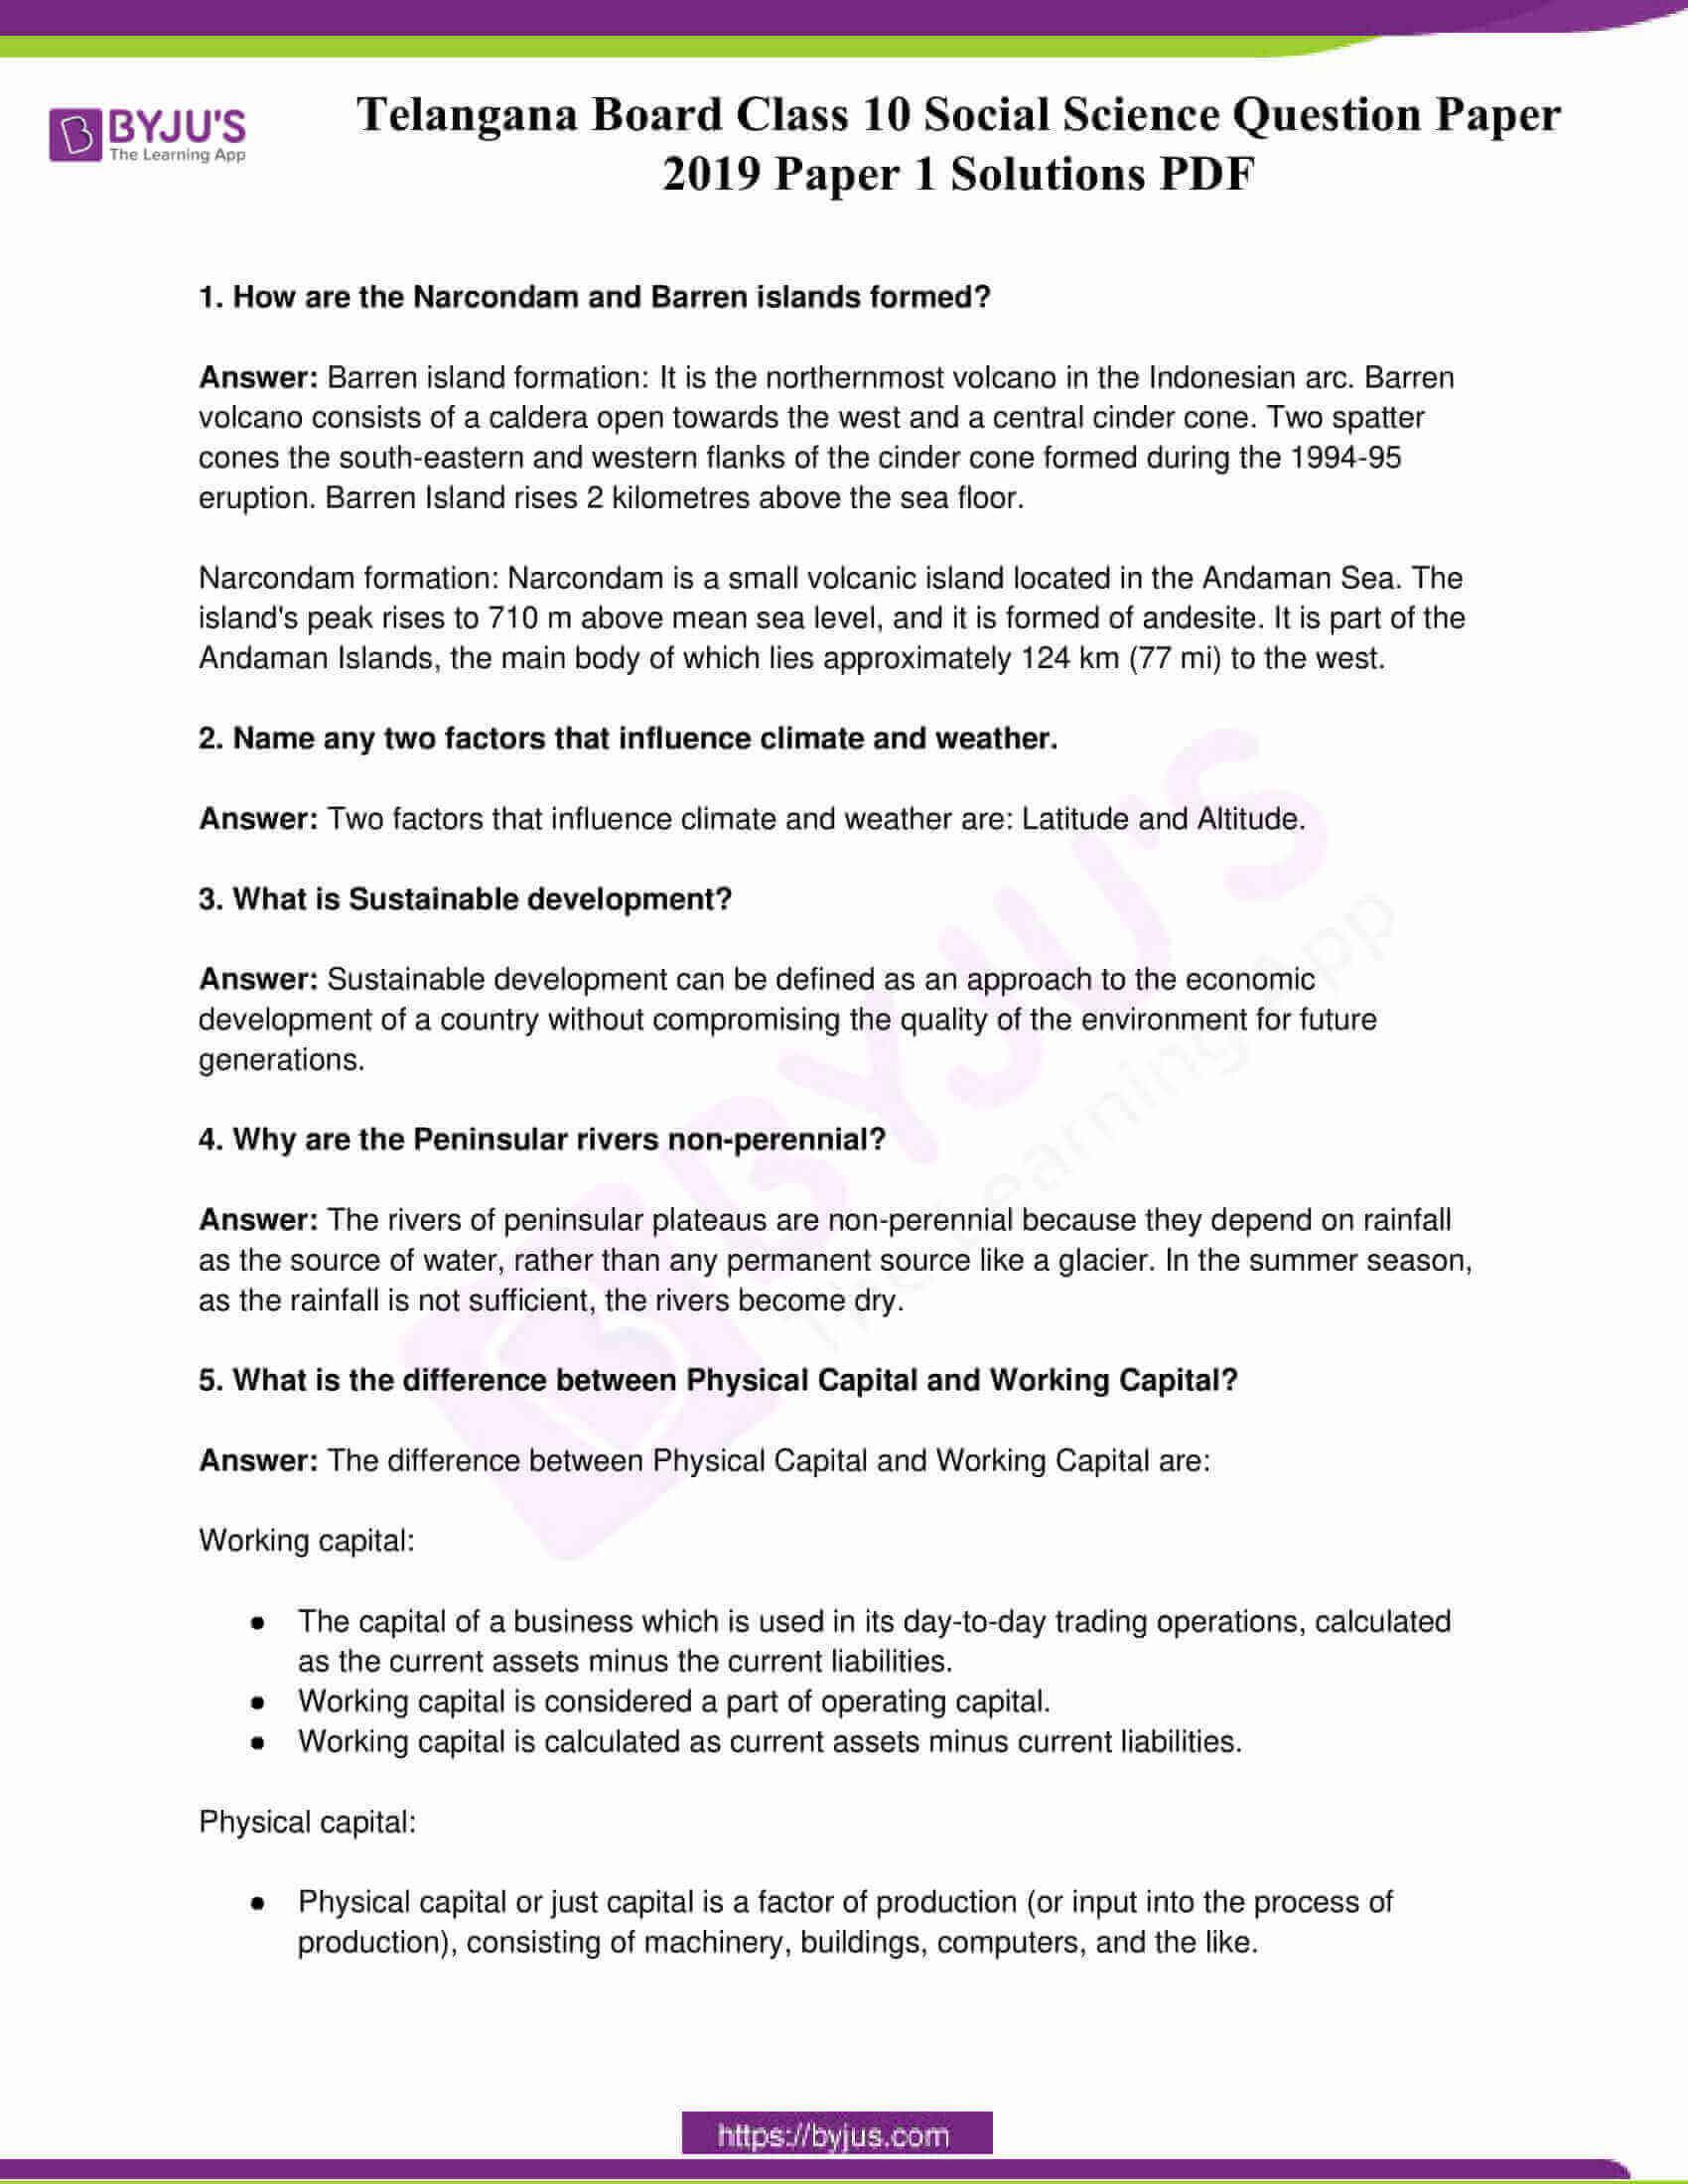 telangana board class 10 social science 2019 paper 1 solutions 1